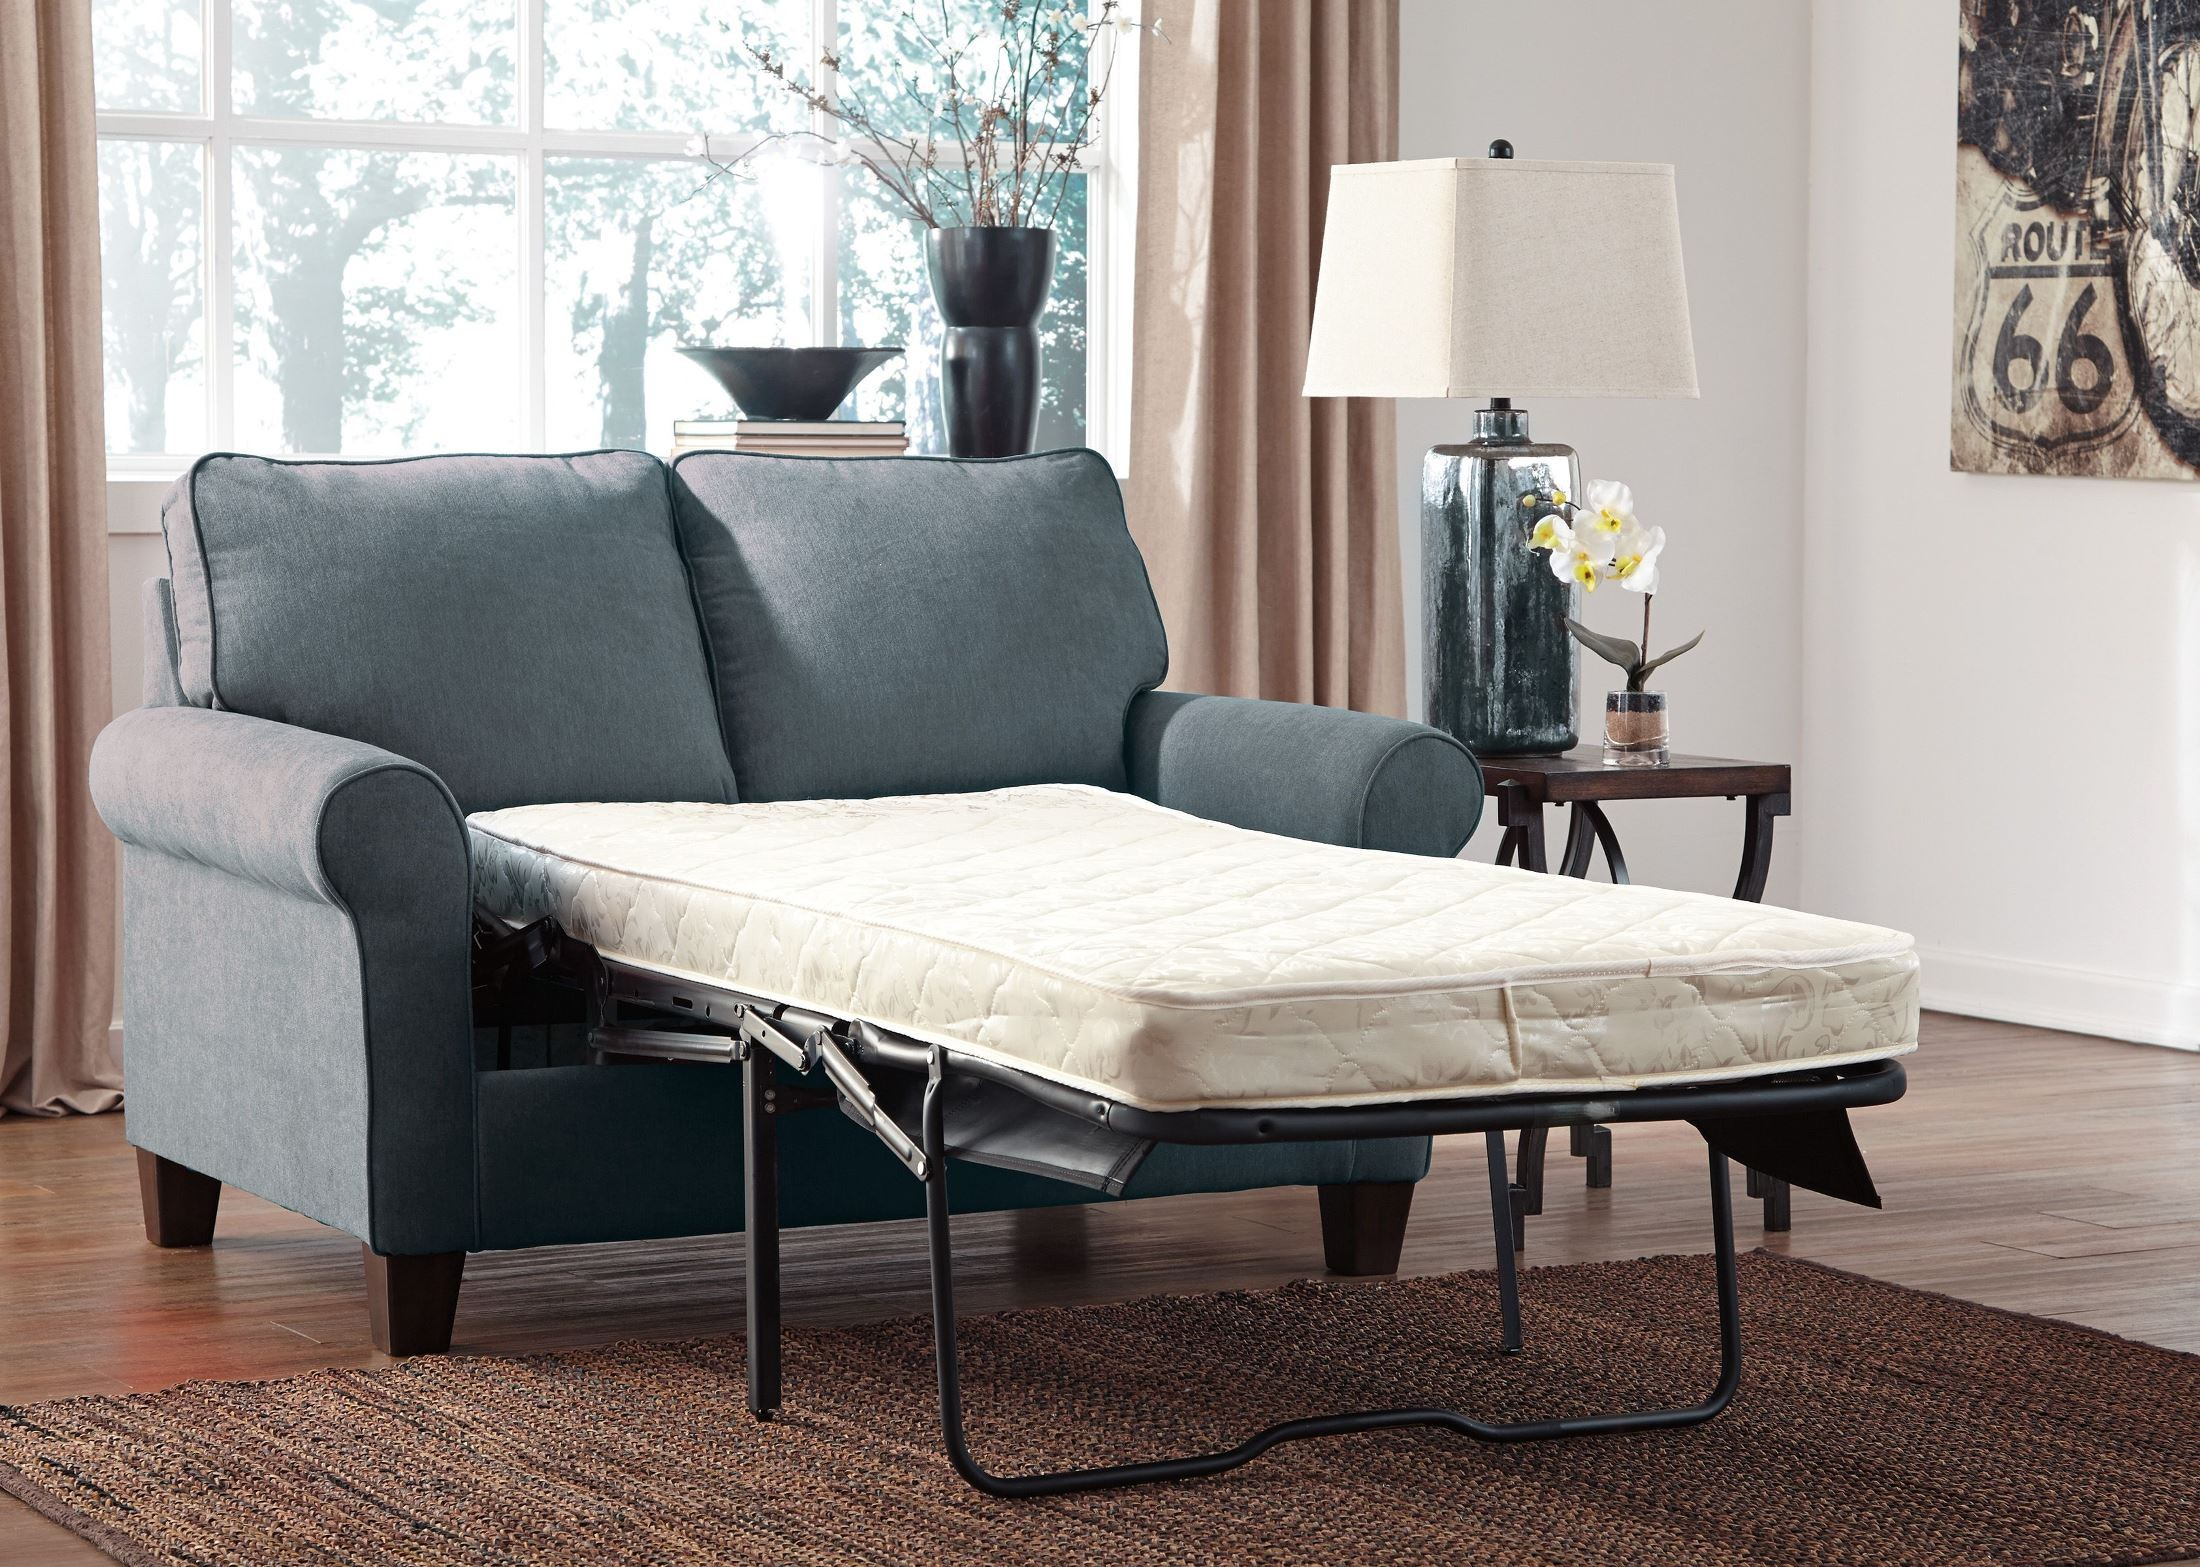 Zeth Denim Twin Sofa Sleeper from Ashley 2710137  : 27101 37 open from colemanfurniture.com size 2200 x 1567 jpeg 792kB